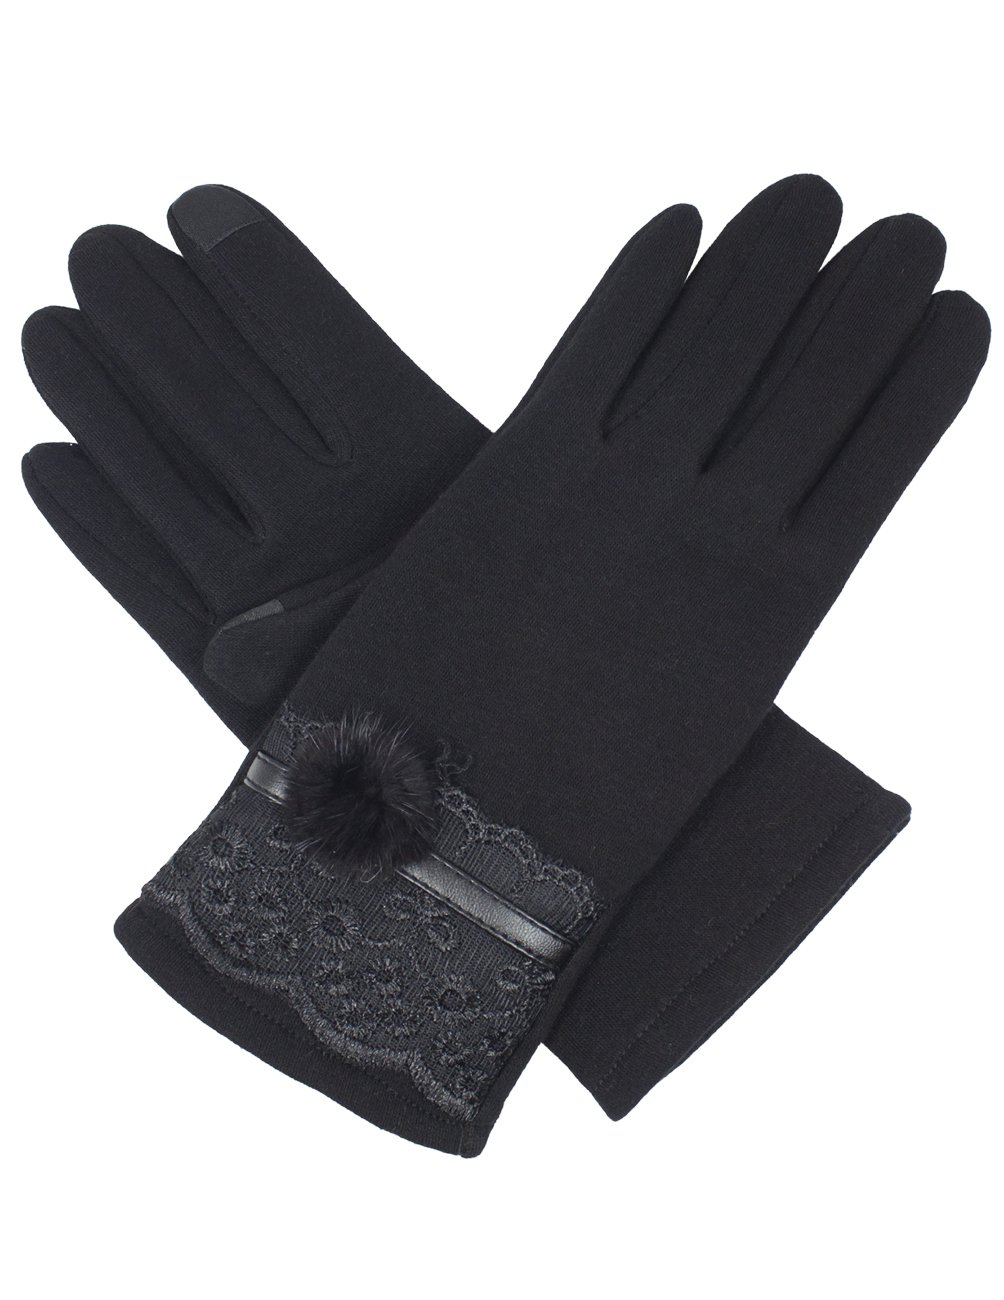 Dahlia Women's Lined Touchscreen Gloves - Faux Fur Lace Cuff Gloves - Black